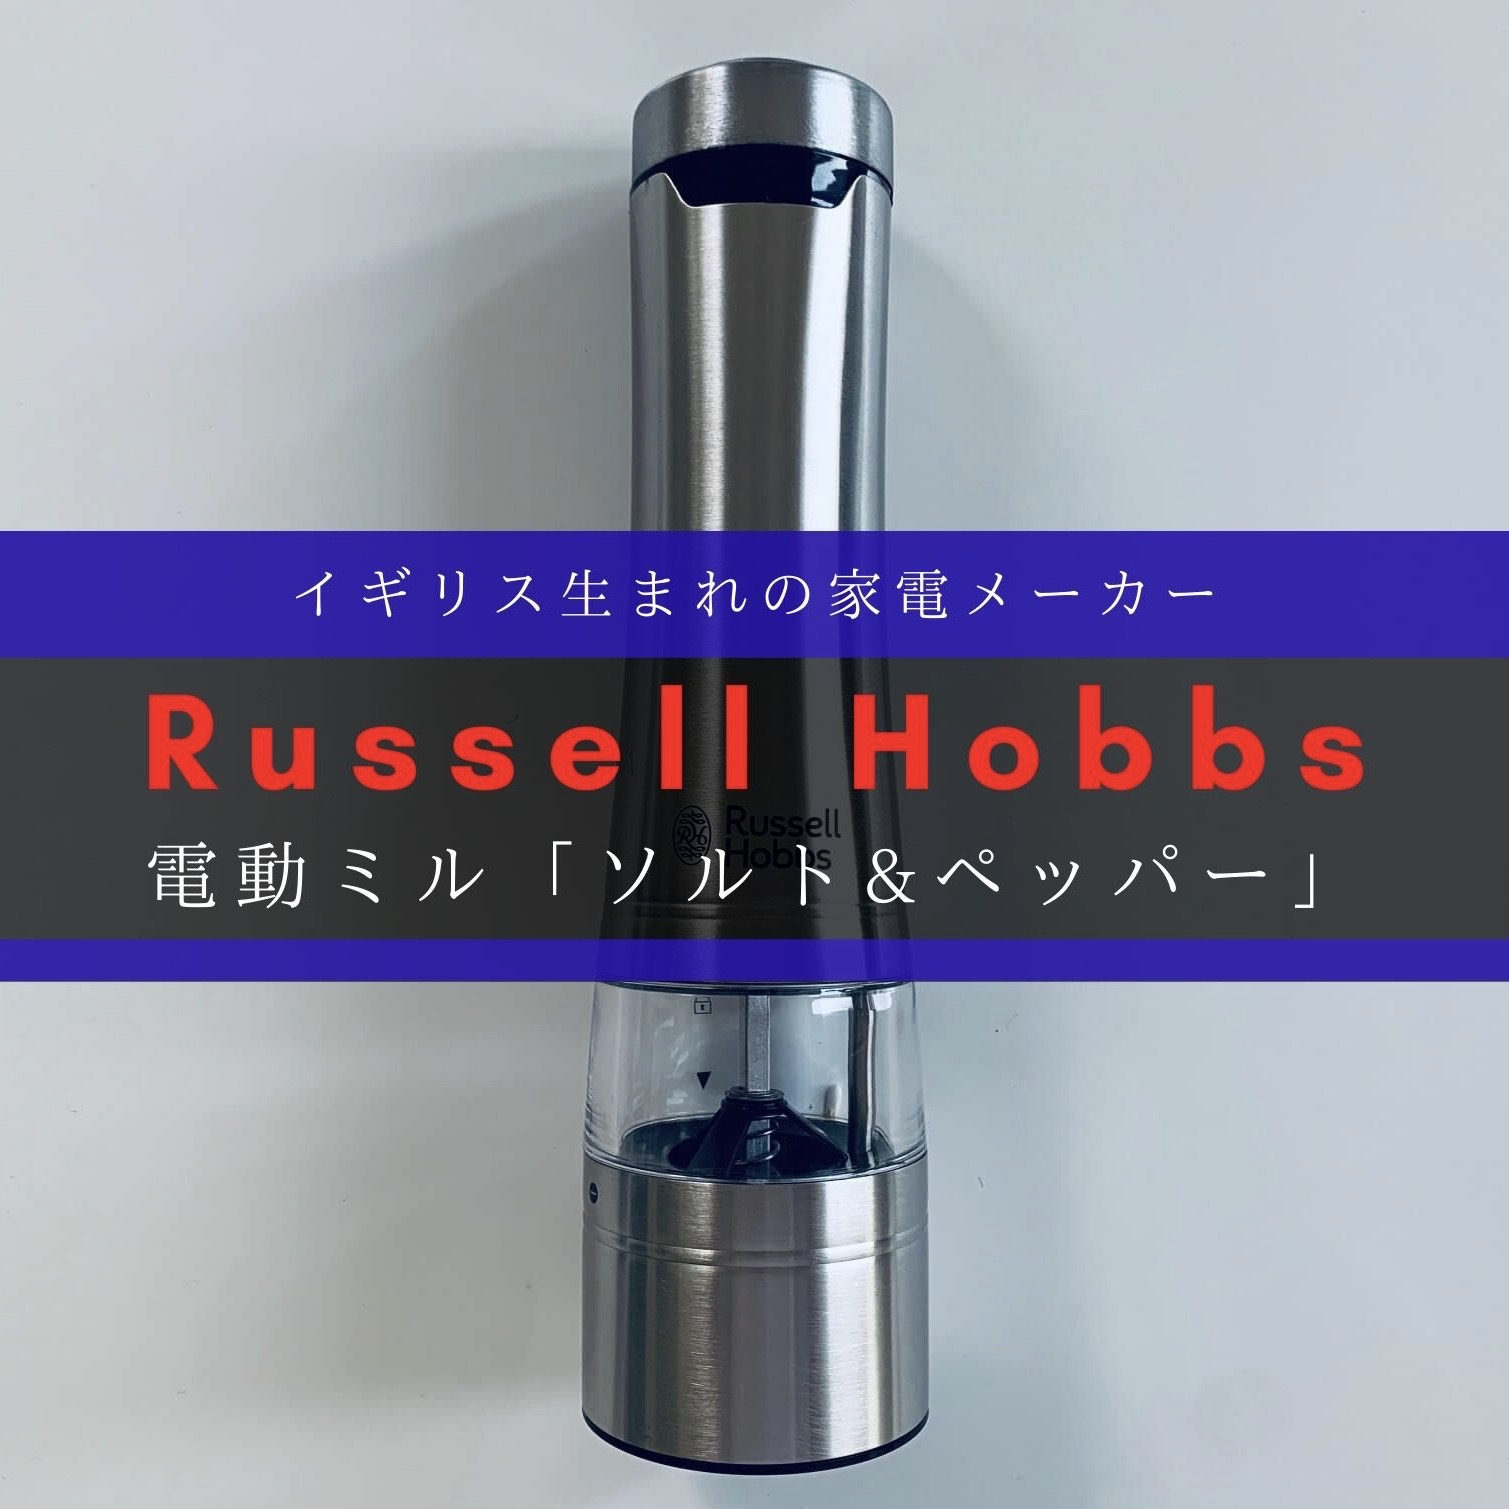 Russell Hobbs(ラッセルホブス)電動ミル『ソルト&ペッパー』